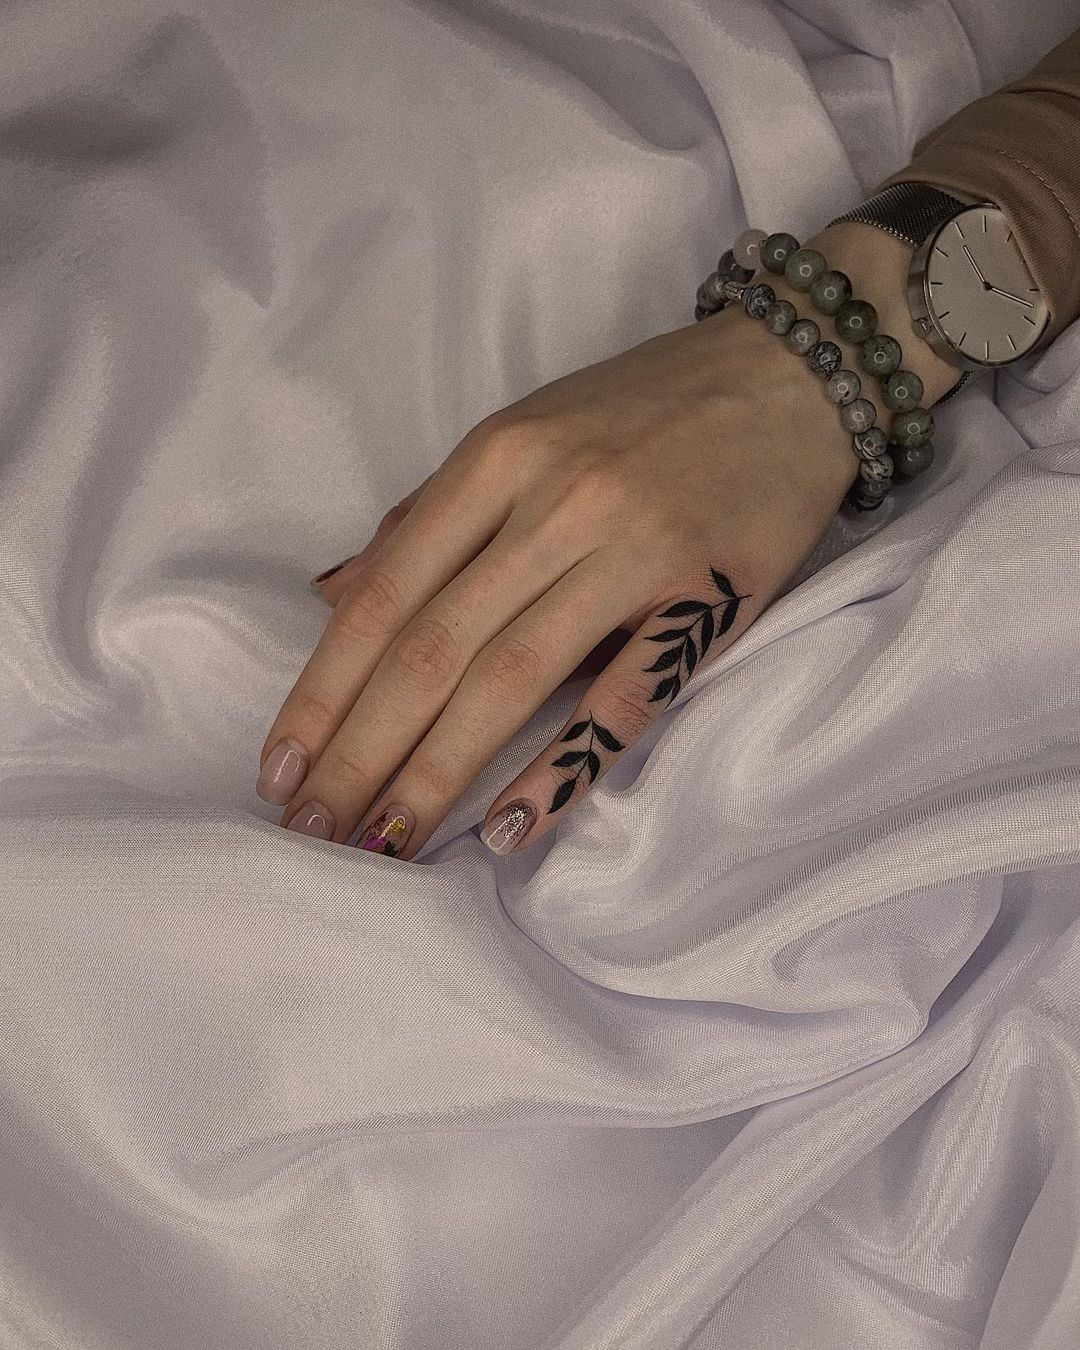 aurora.tattooo_163300761_750751755634157_4499331707032085669_n